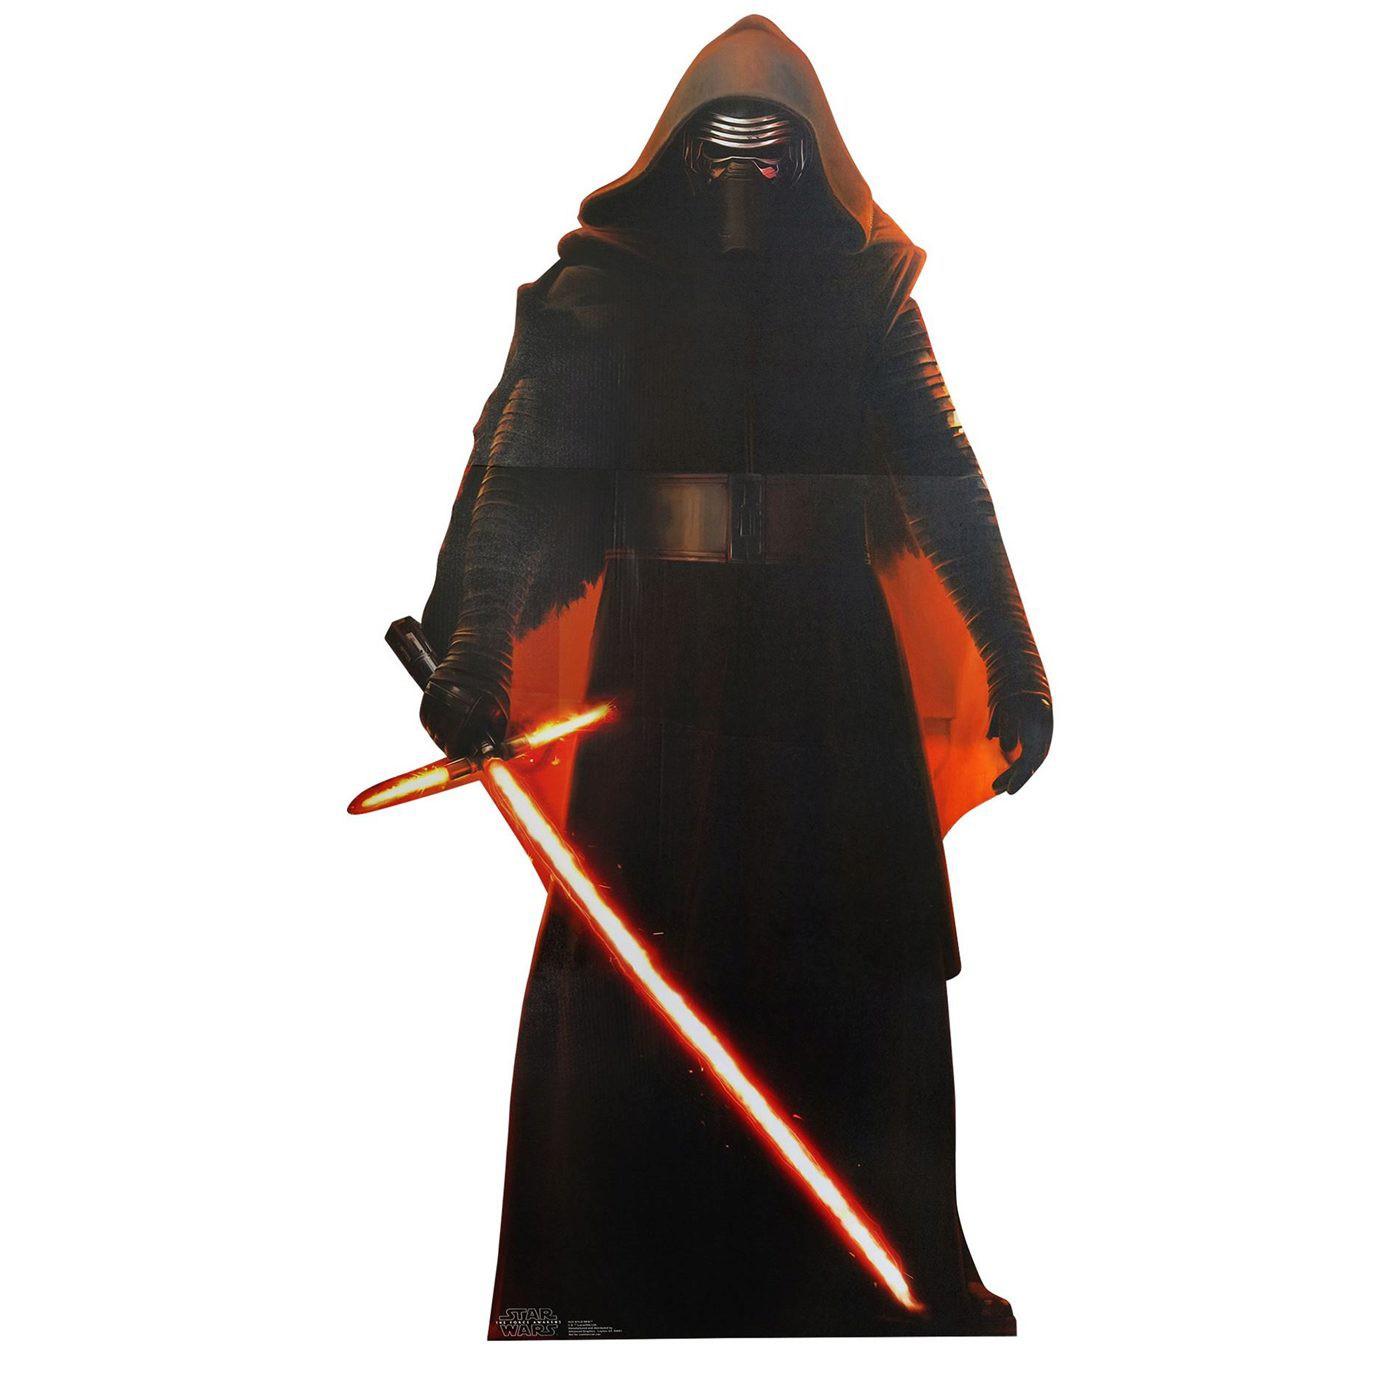 Star Wars Force Awakens Kylo Ren Cardboard Cutout